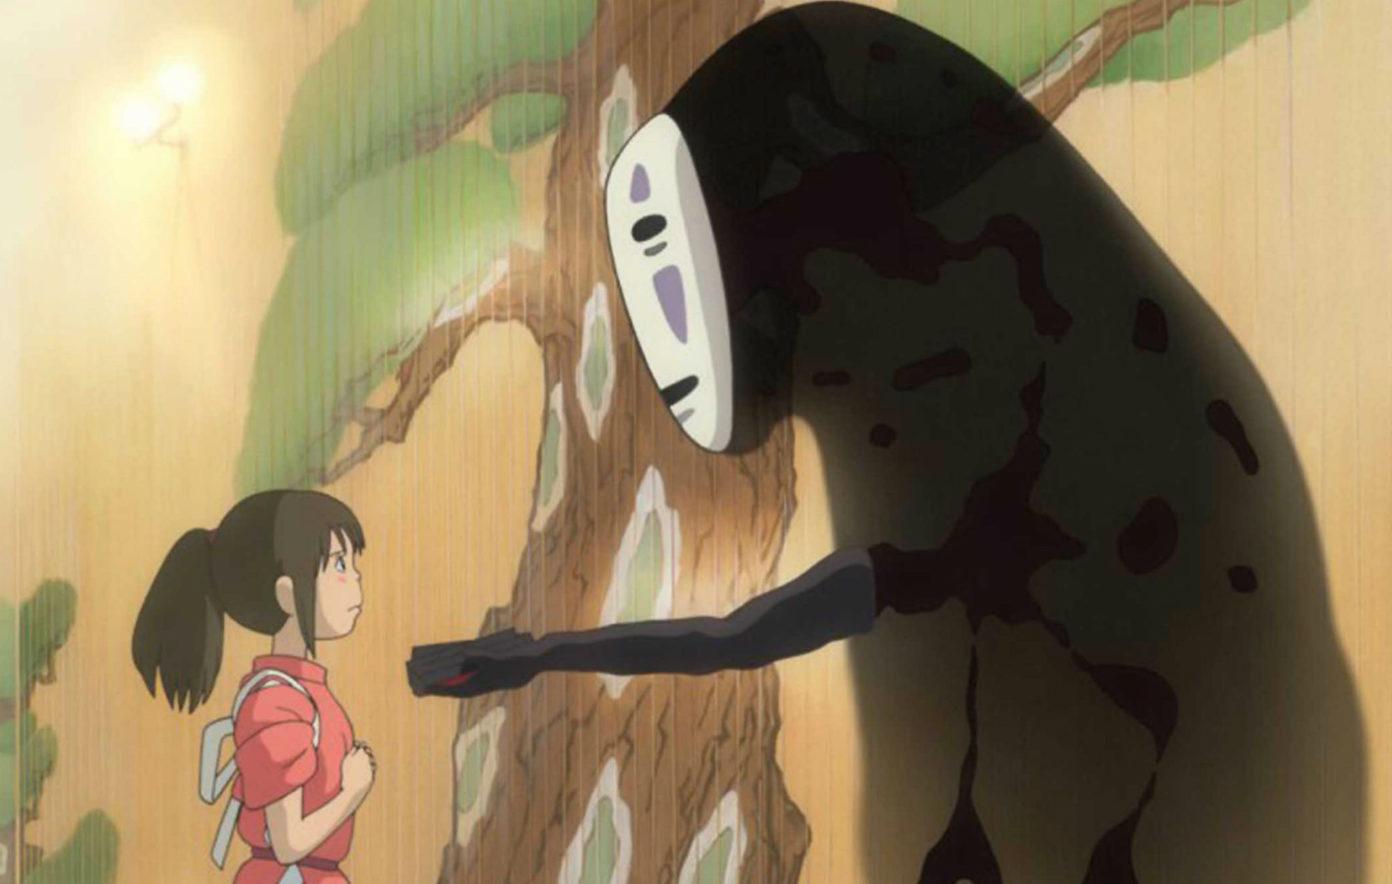 Film still from Studio Ghibli's 'Spirited Away' (2001)